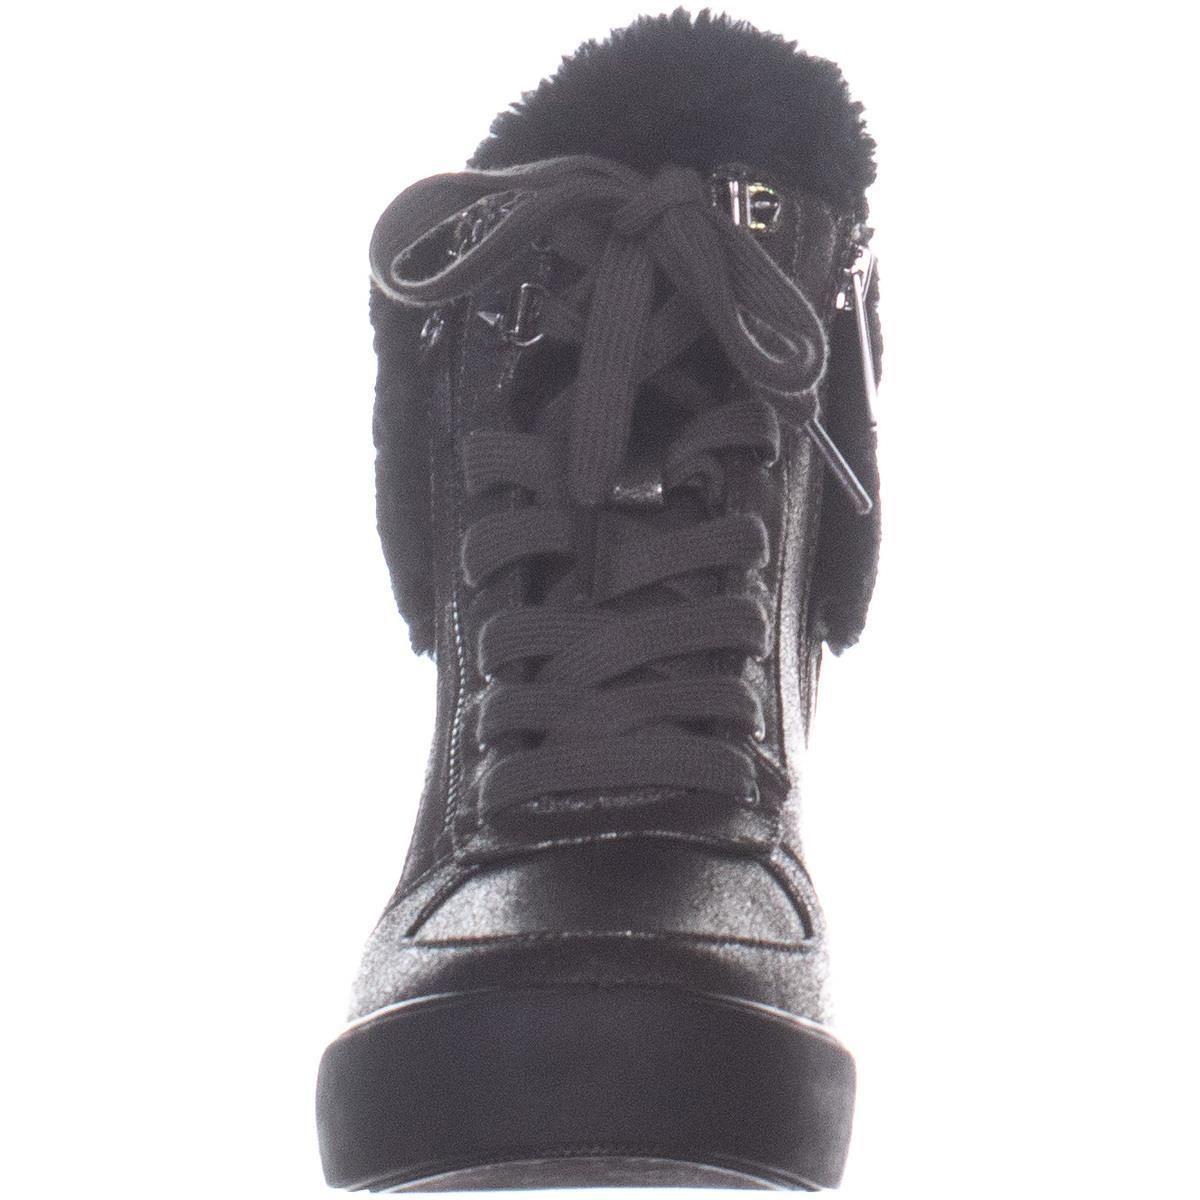 9f529063c7b Guess - Multicolor Dustyn Hidden-wedge Fashion Sneakers - Lyst. View  fullscreen